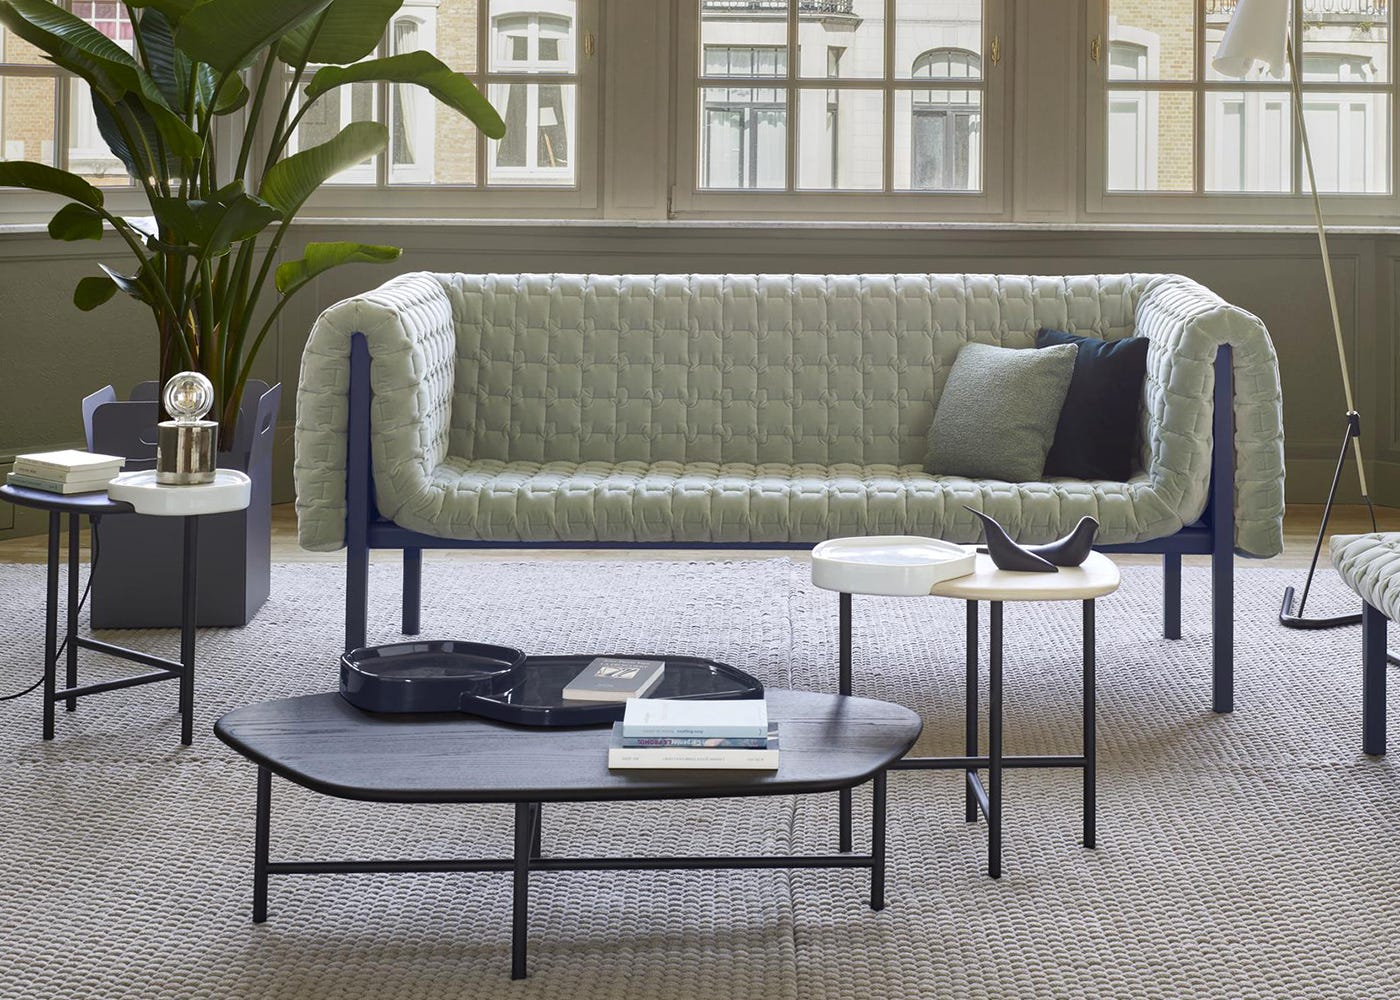 Lewa Side Table & Coffee Table